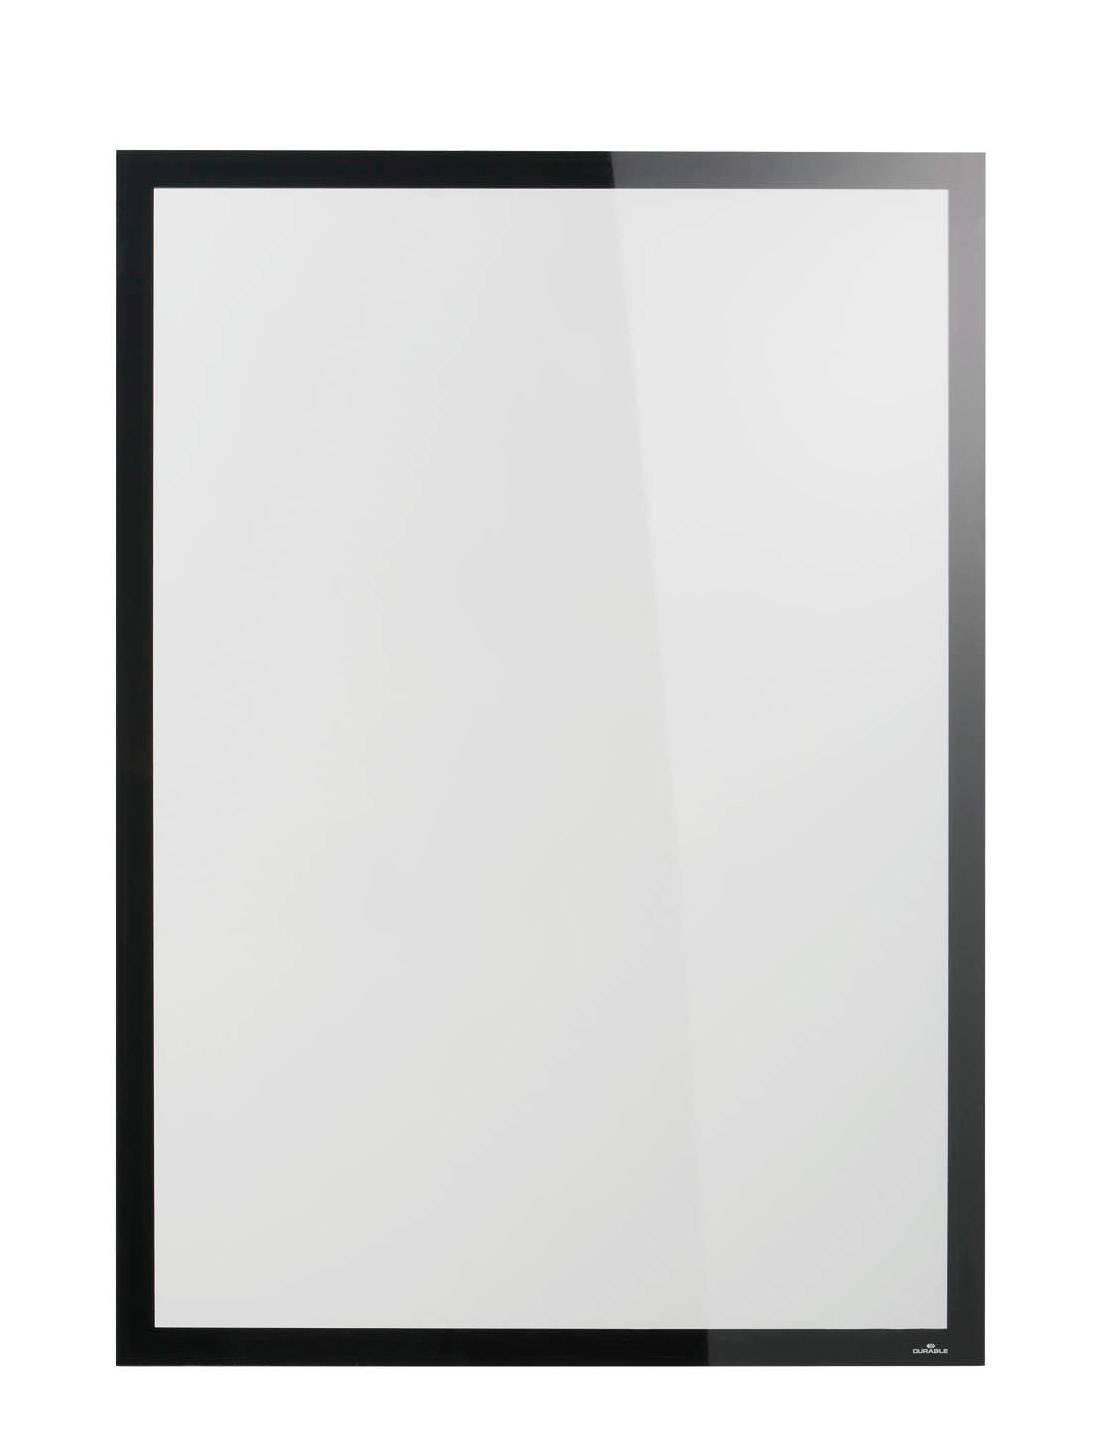 Магнитная рамка Durable Duraframe Poster Sun черный (5005-01) - фото 1